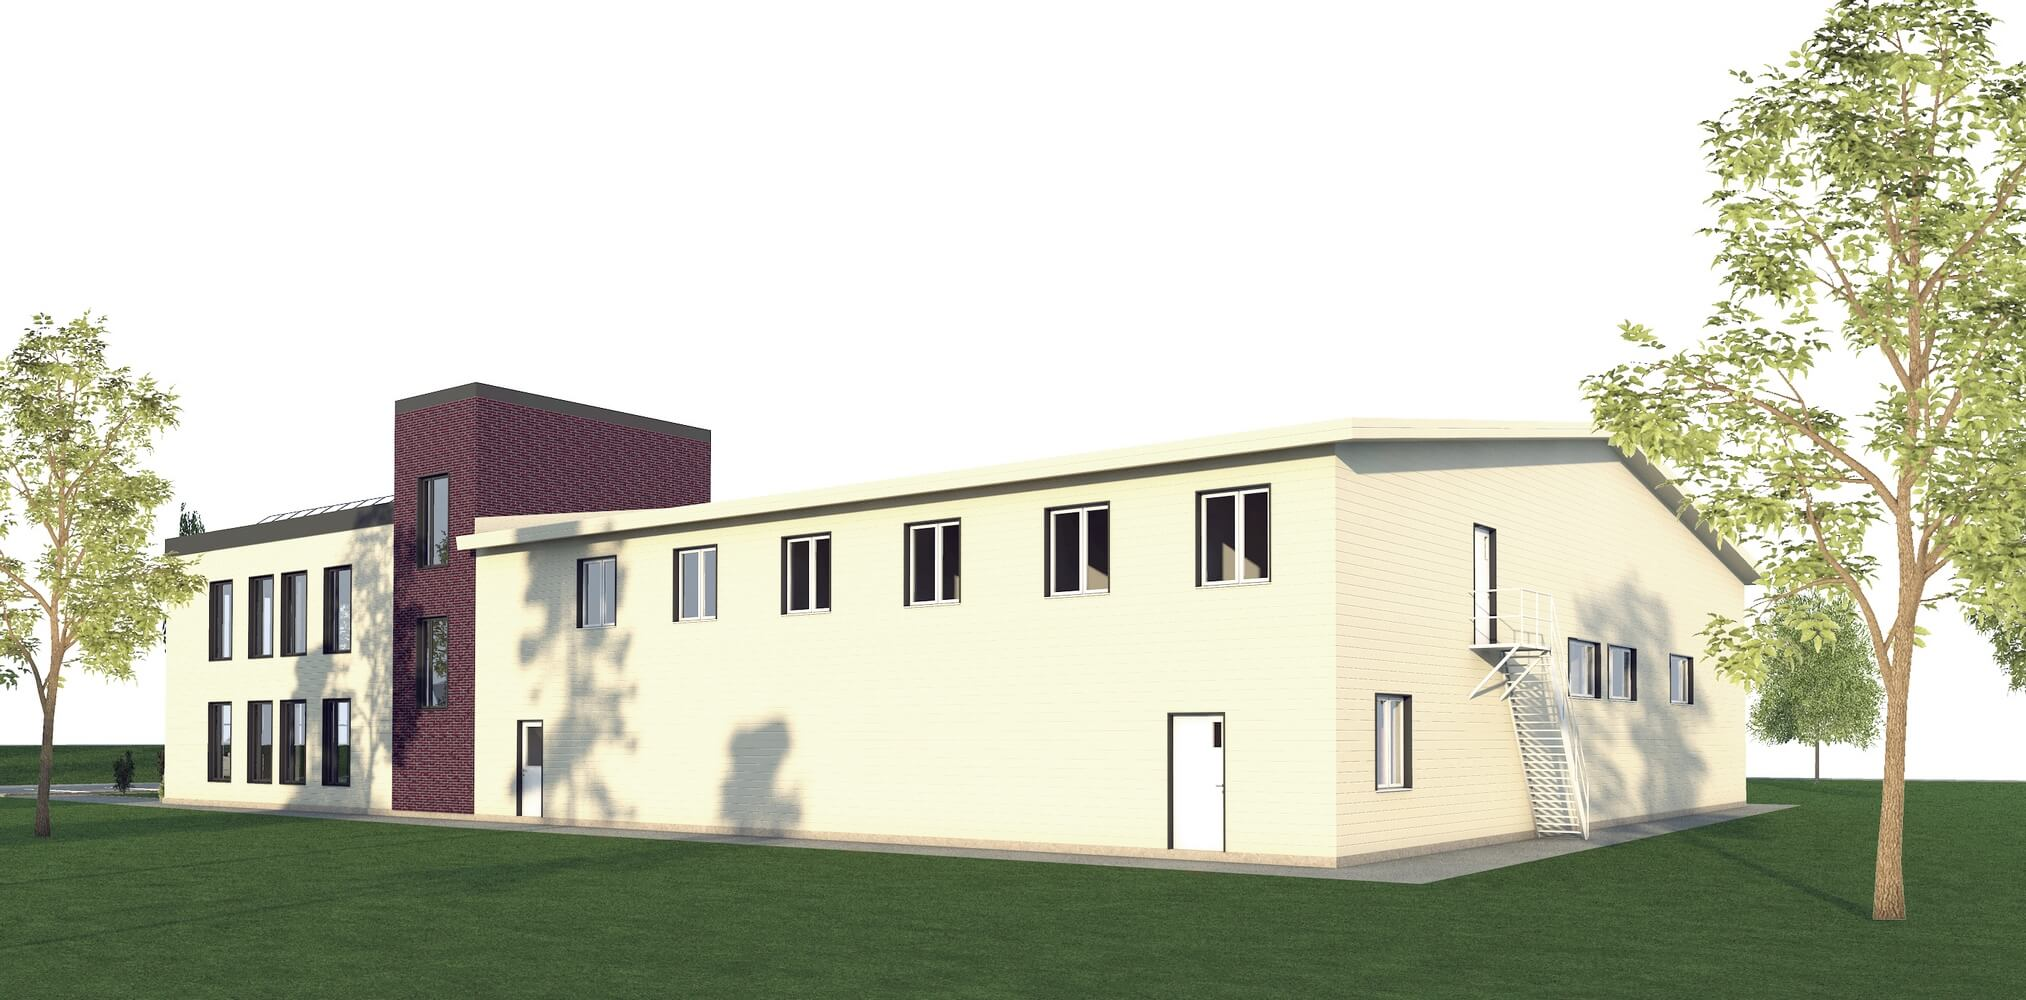 Проект магазина-склада (изображение 2)